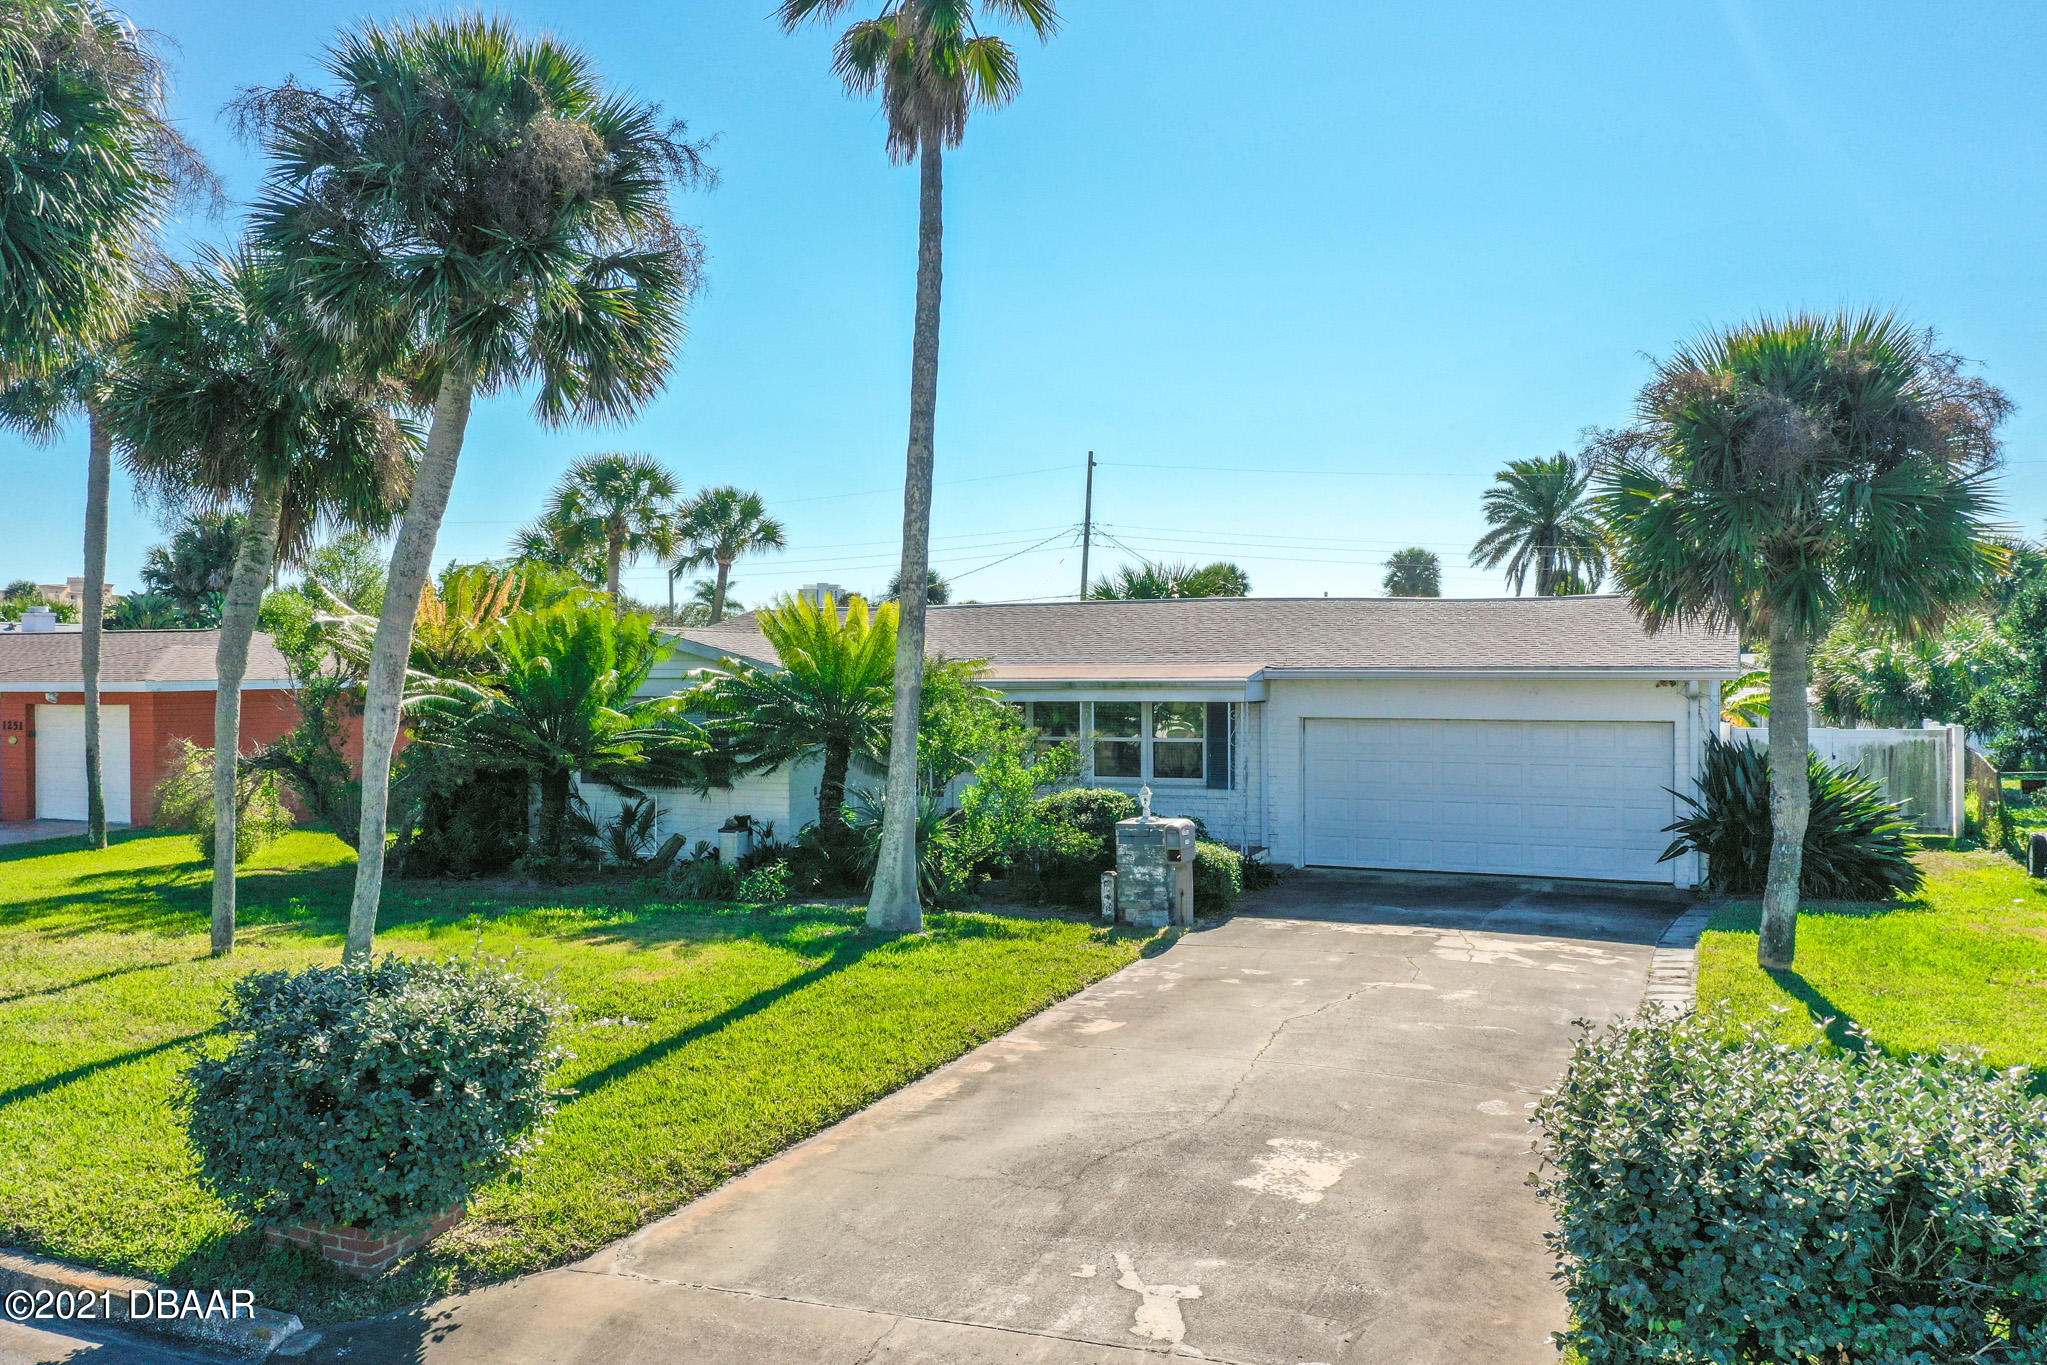 Photo of 1255 Belaire Drive, Daytona Beach, FL 32118